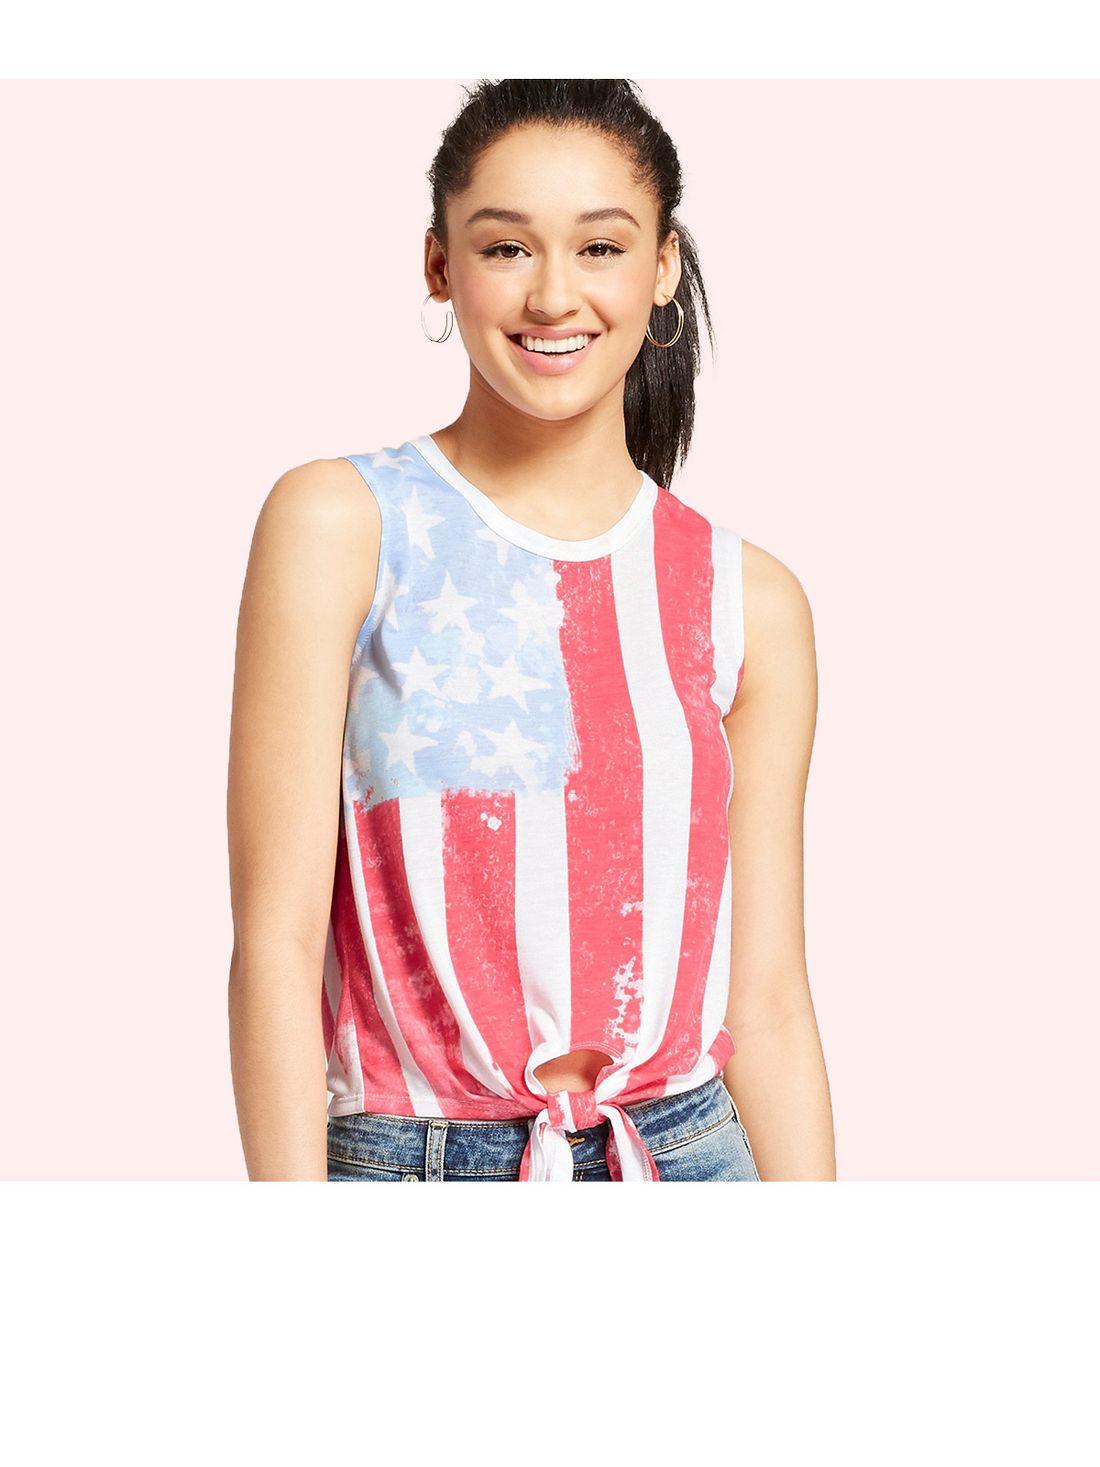 Americana tees